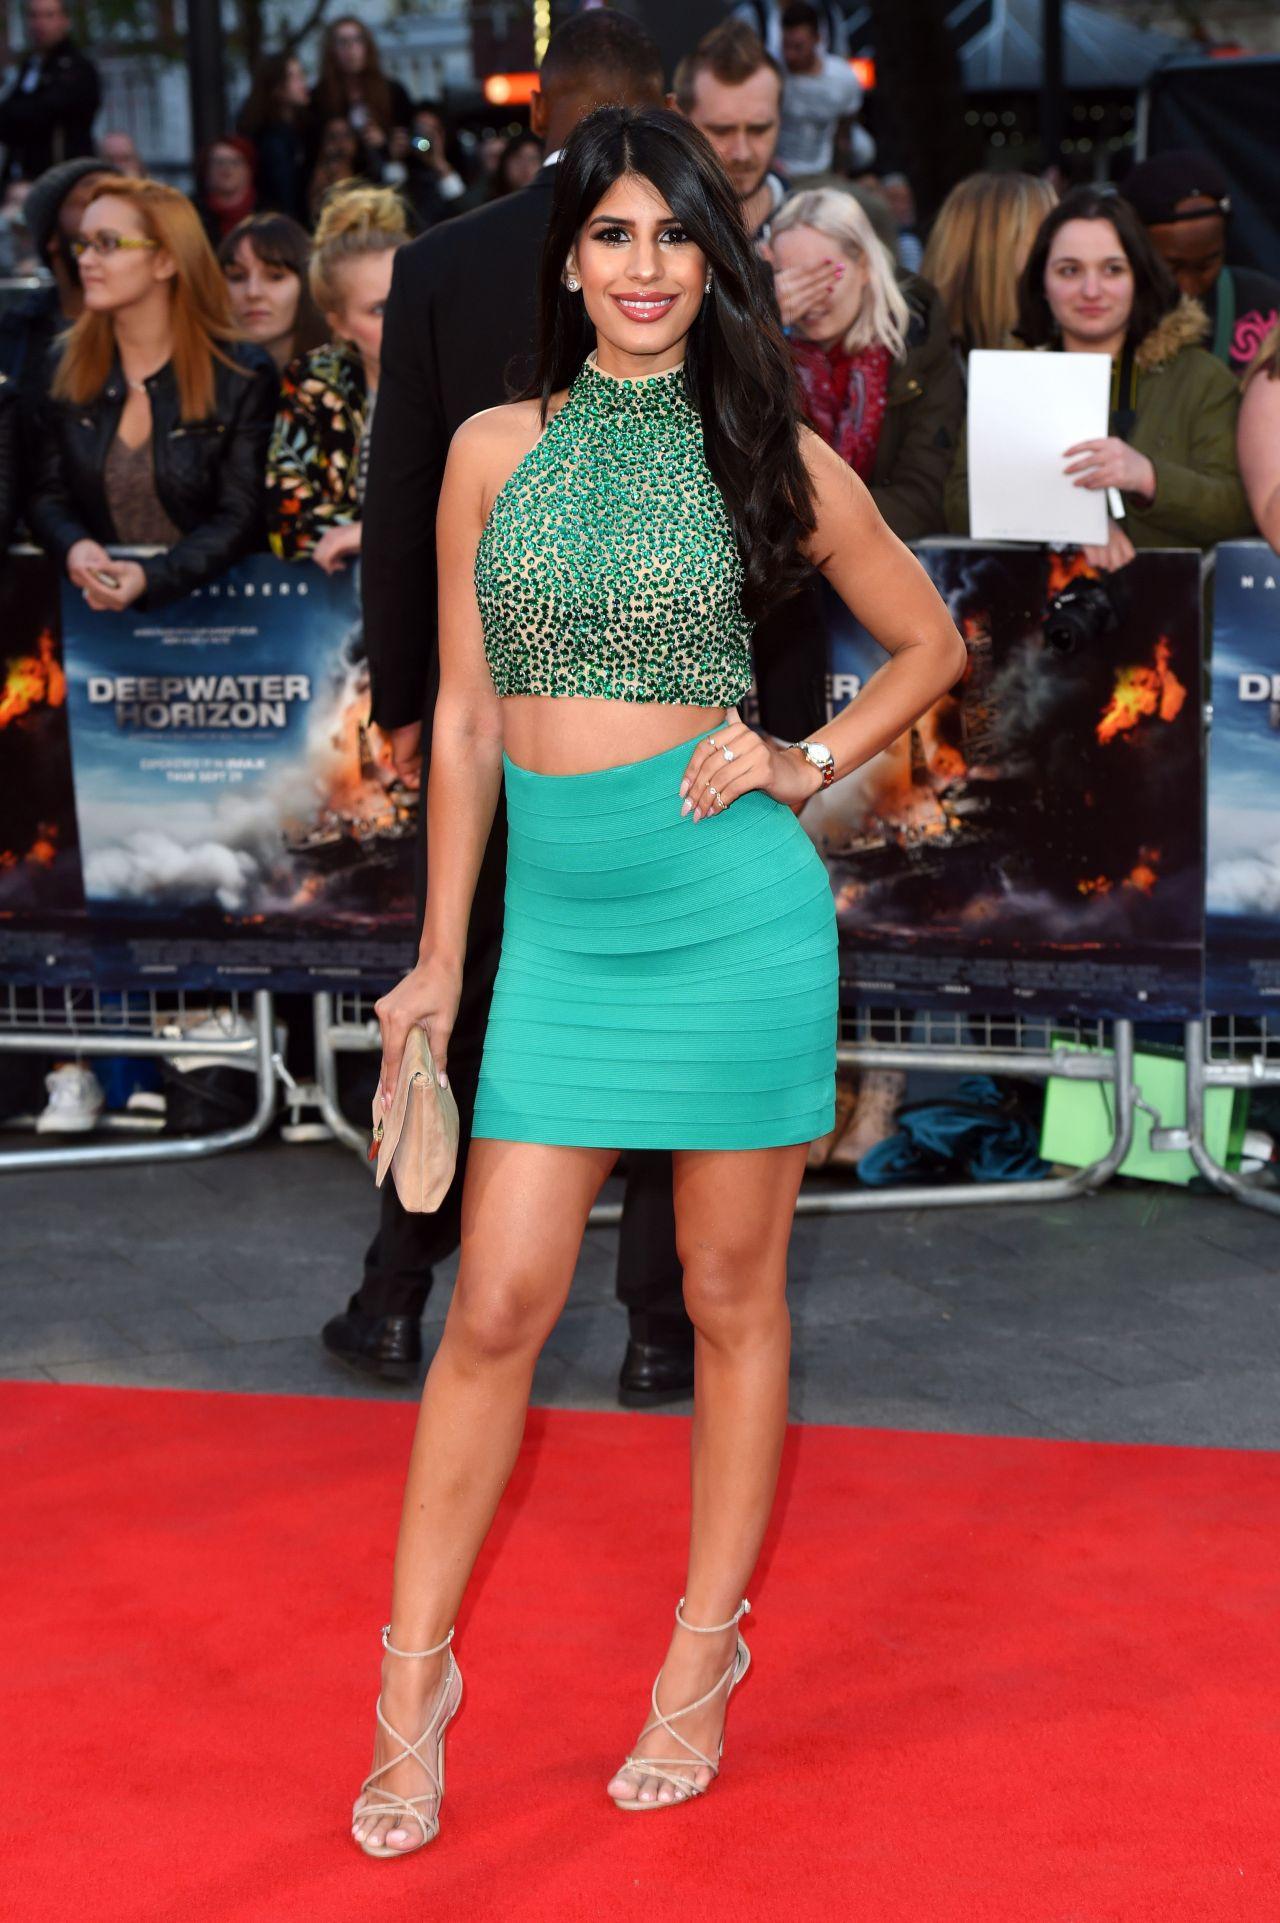 Jasmin Walia - 'Deepwater Horizon' Premiere in London, UK ... Miranda Kerr Hair